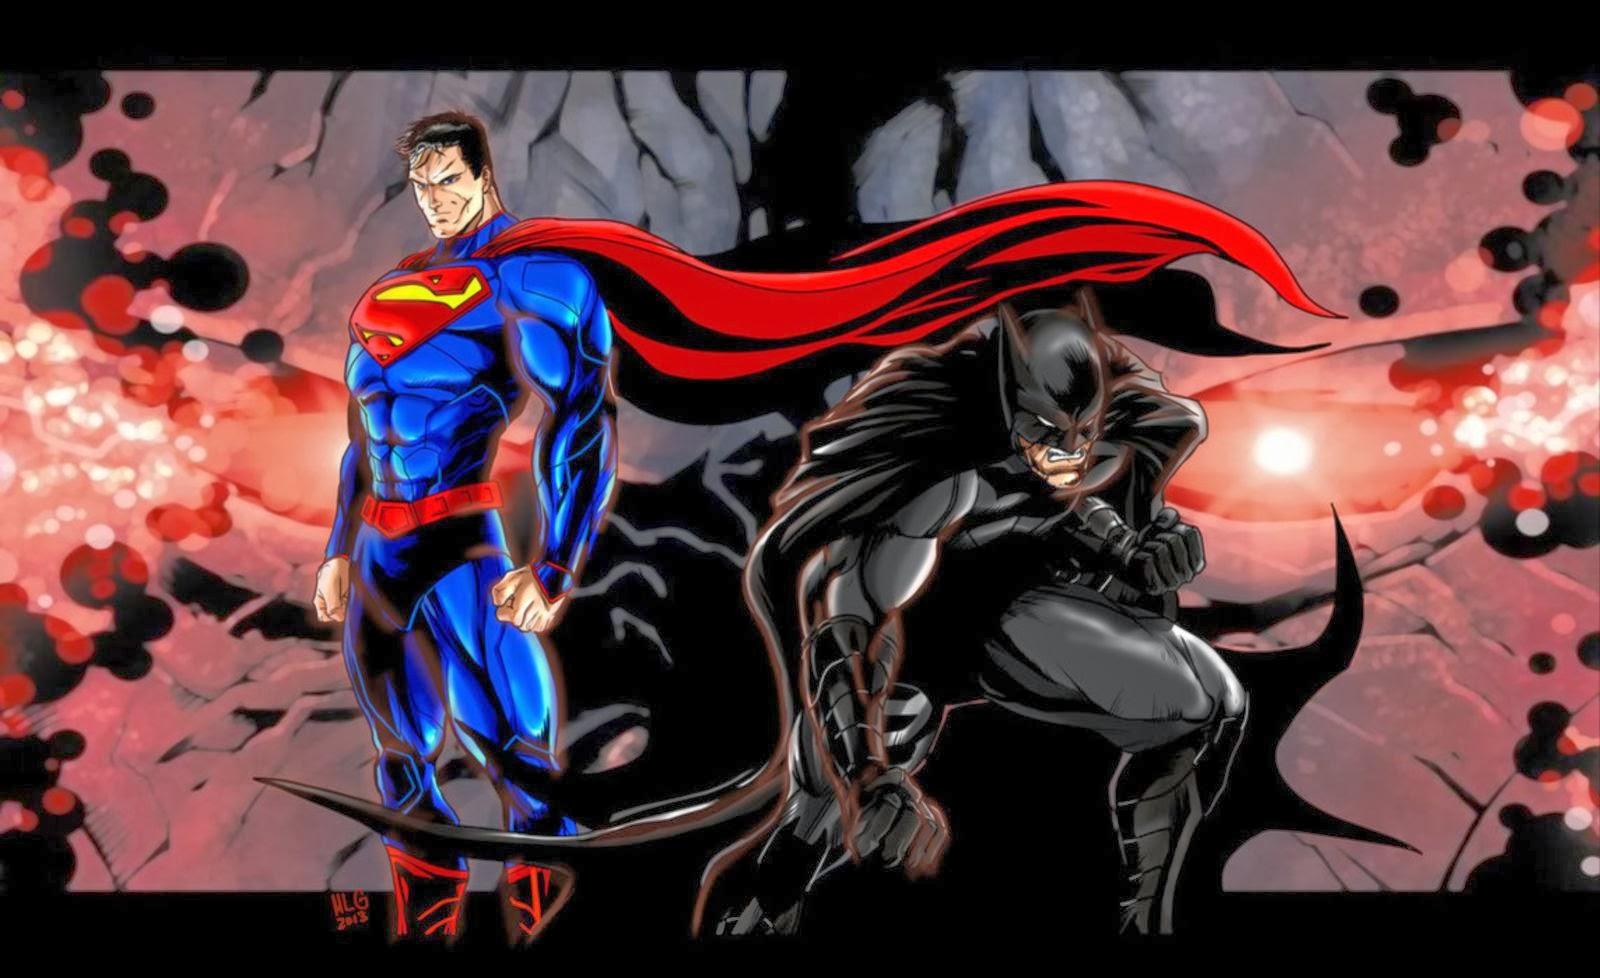 8 JUDUL FILM SUPERMAN VS BATMAN